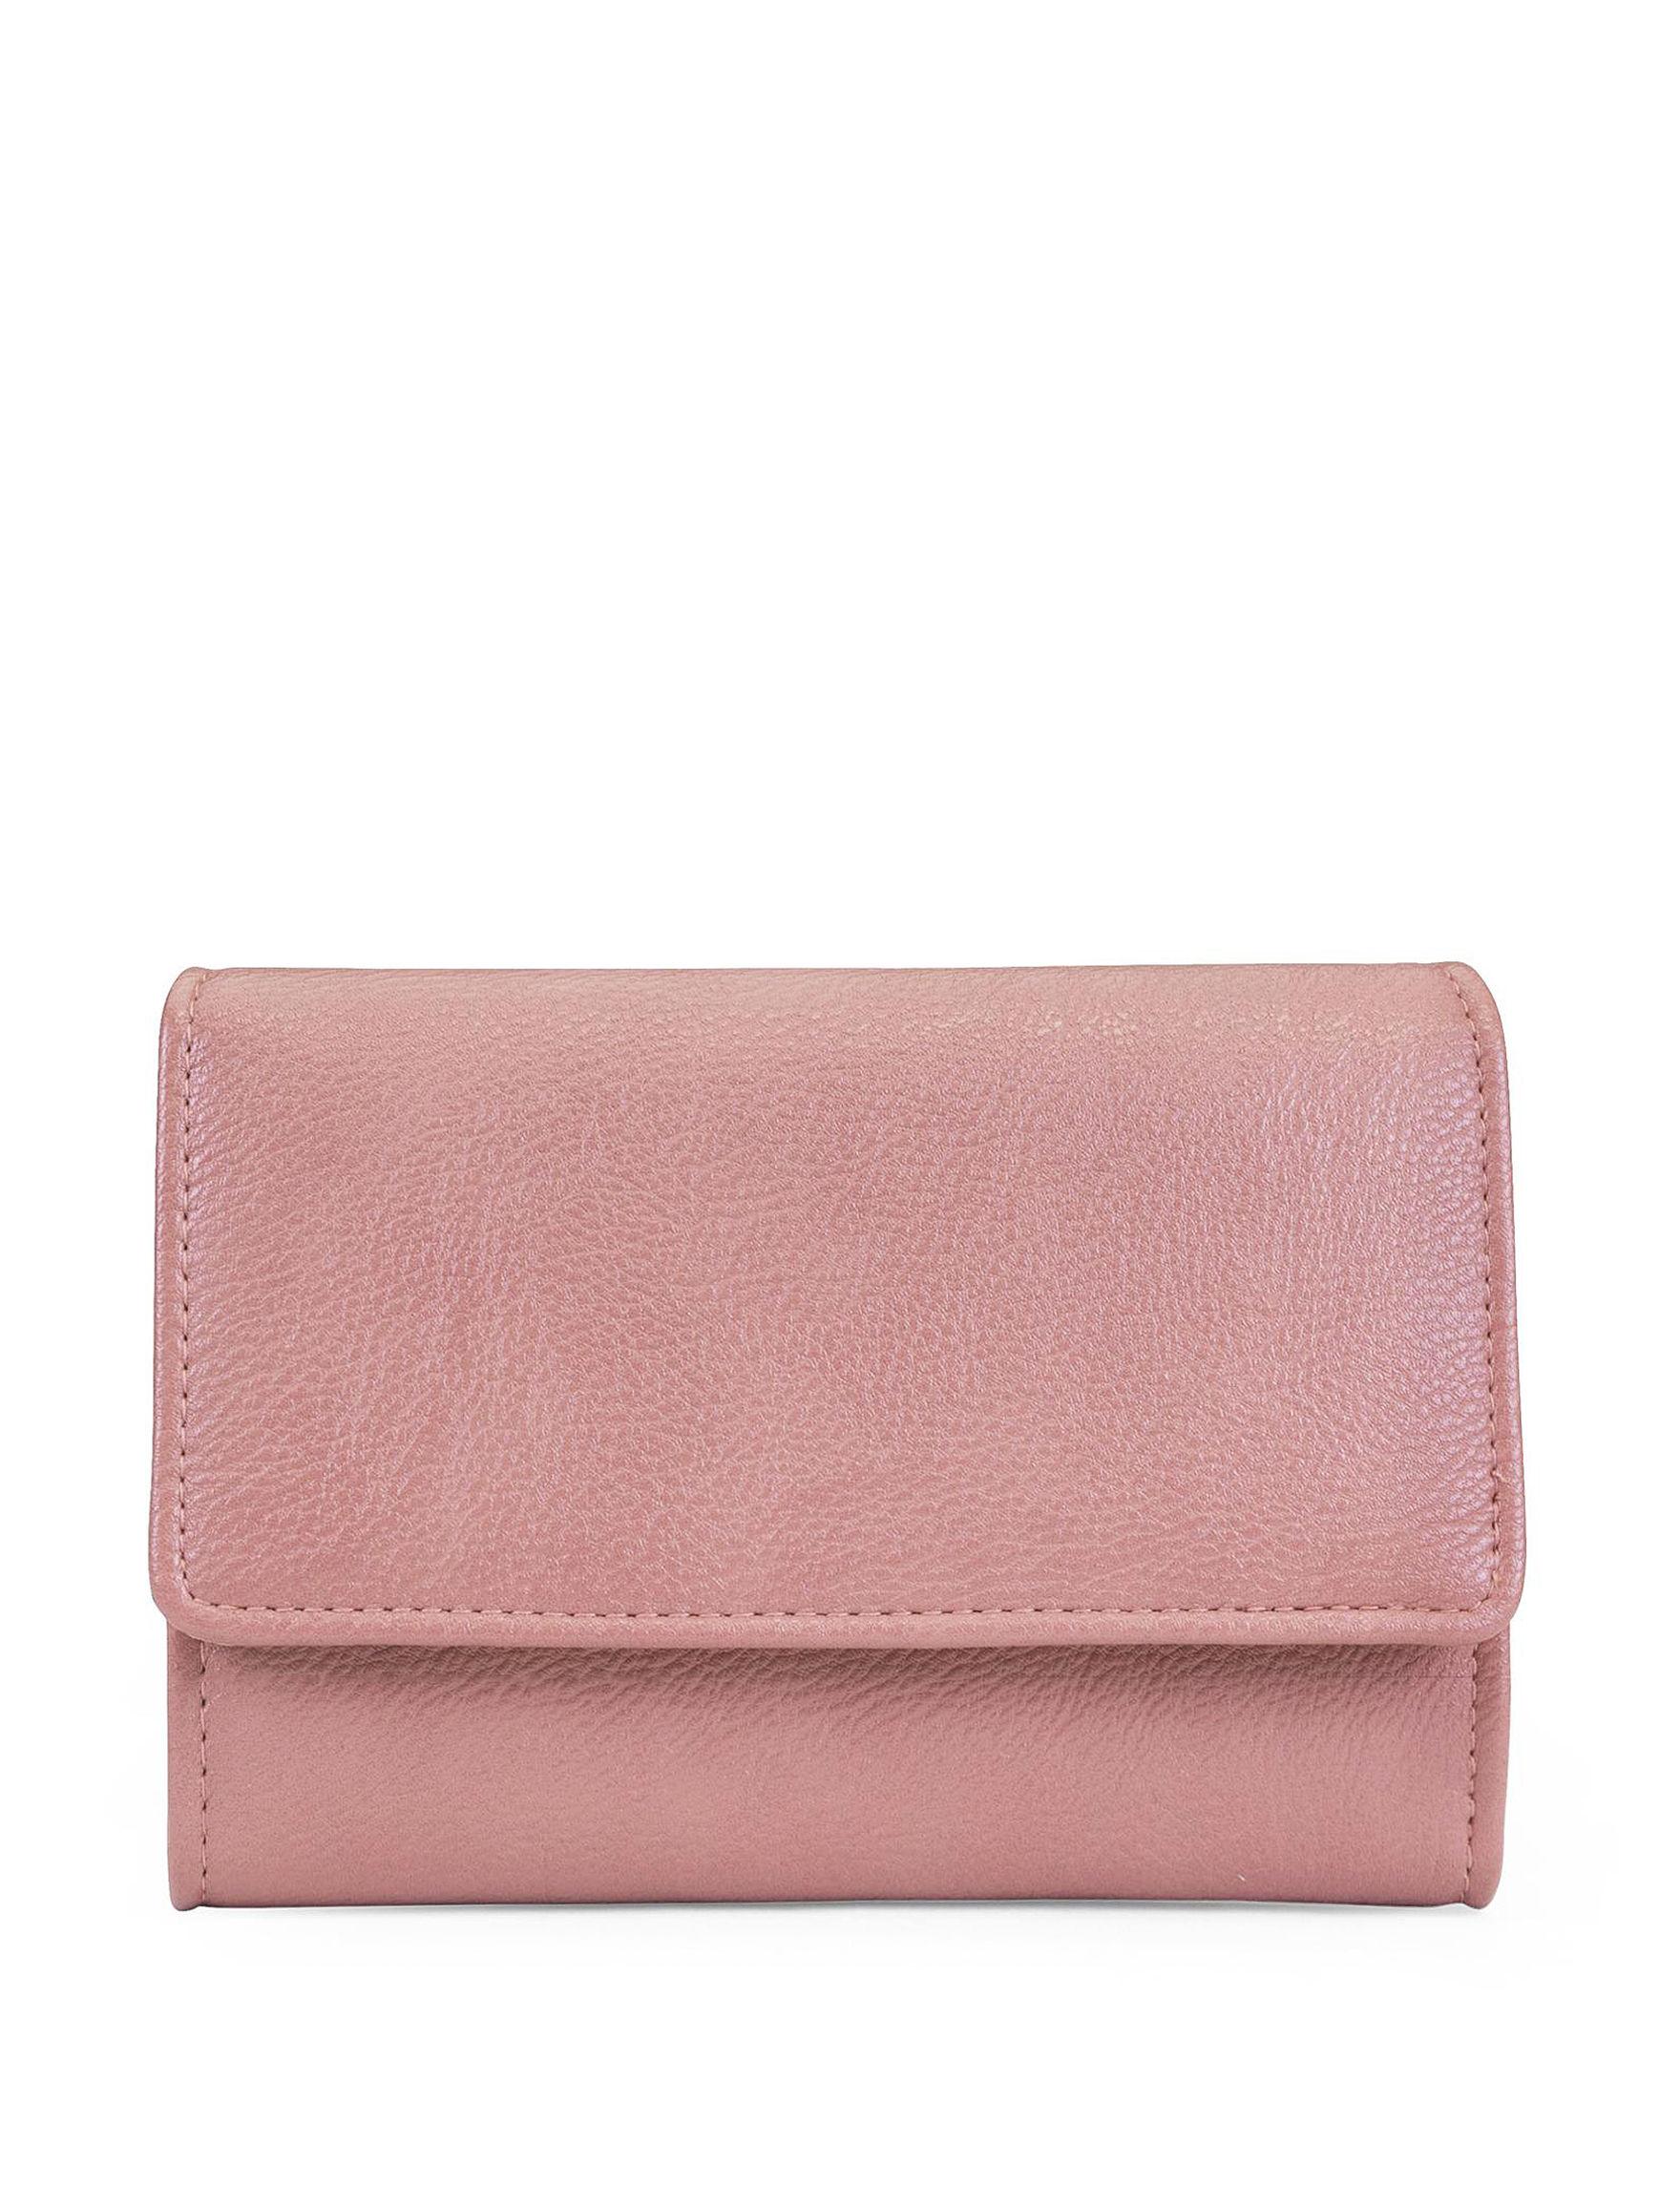 Mundi Pink